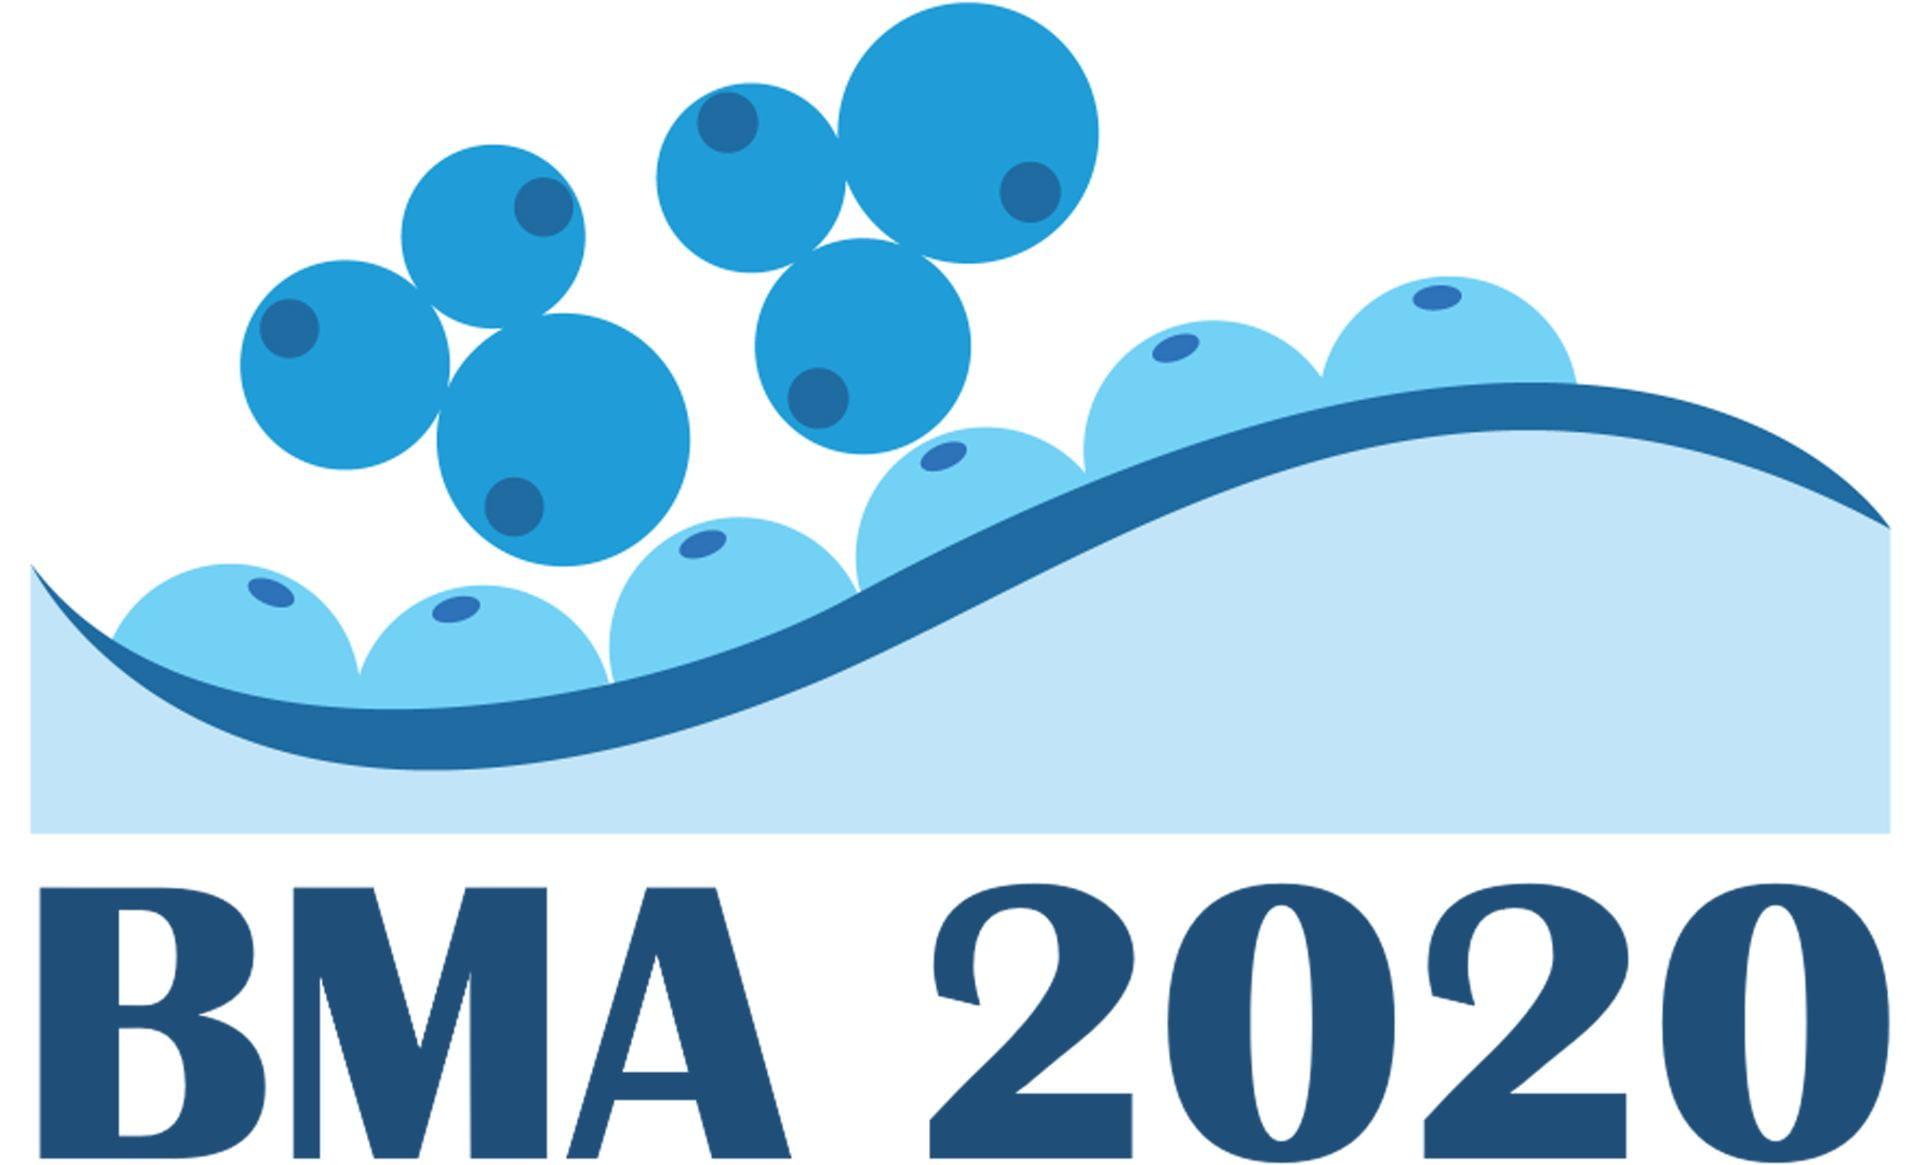 Big happenings at the BMA2020 meeting